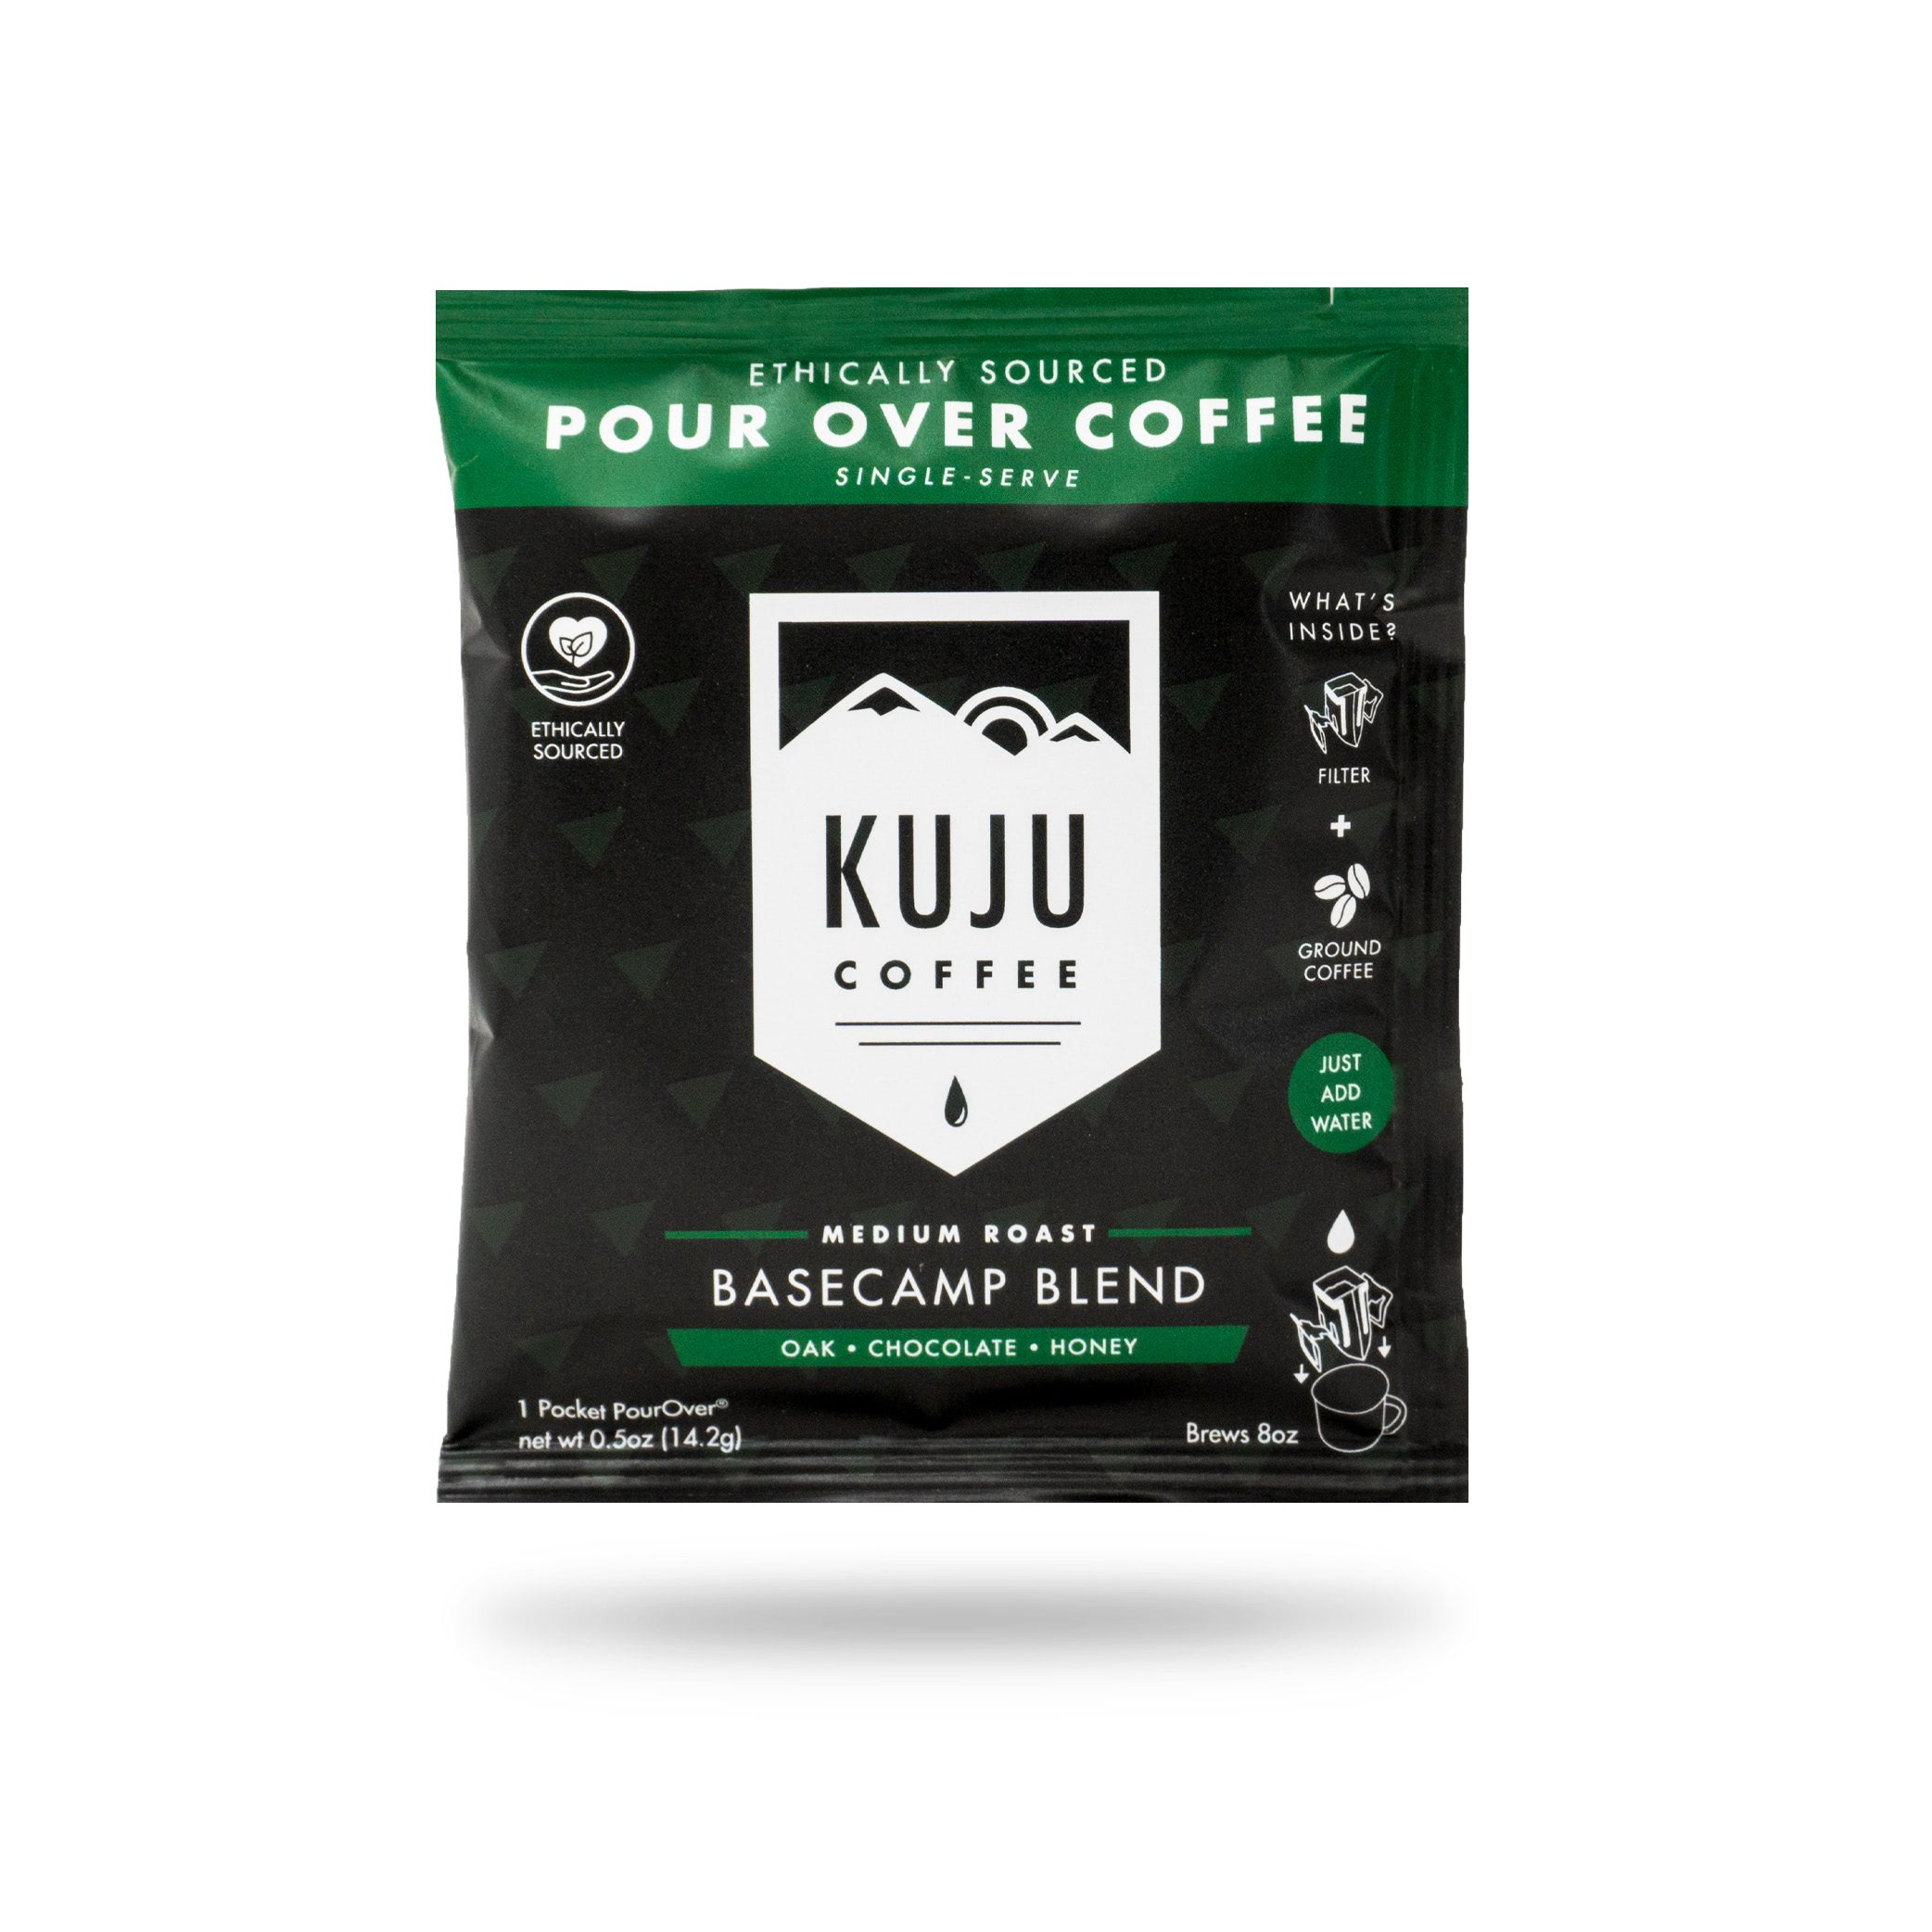 Pocket PourOver Coffee